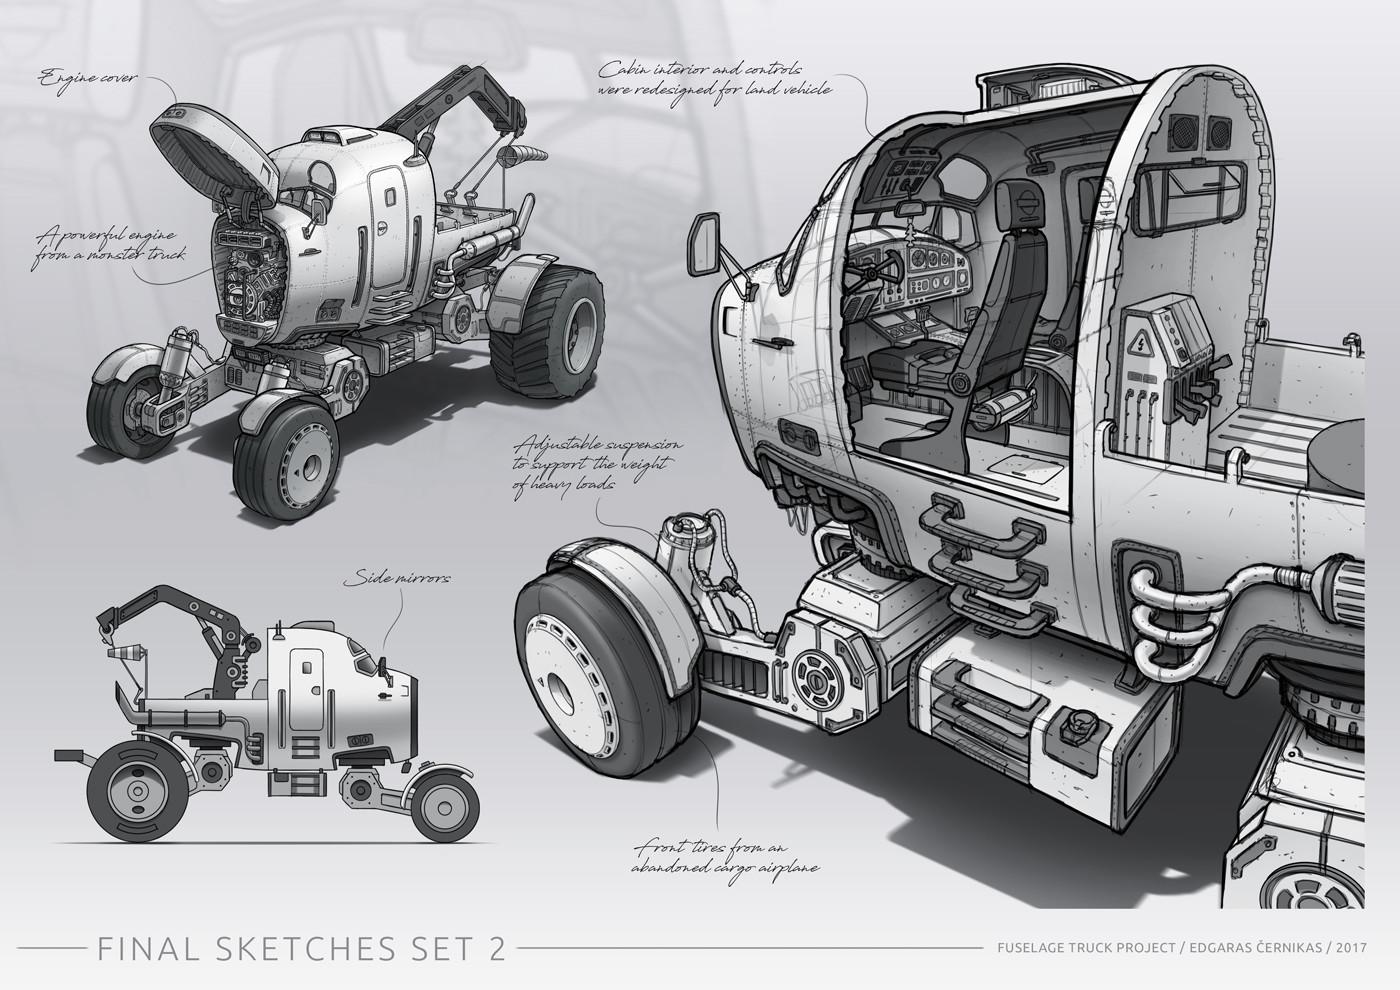 Jonas prunskus edgaras cernikas fuselage truck final sketches set 2 1400x990